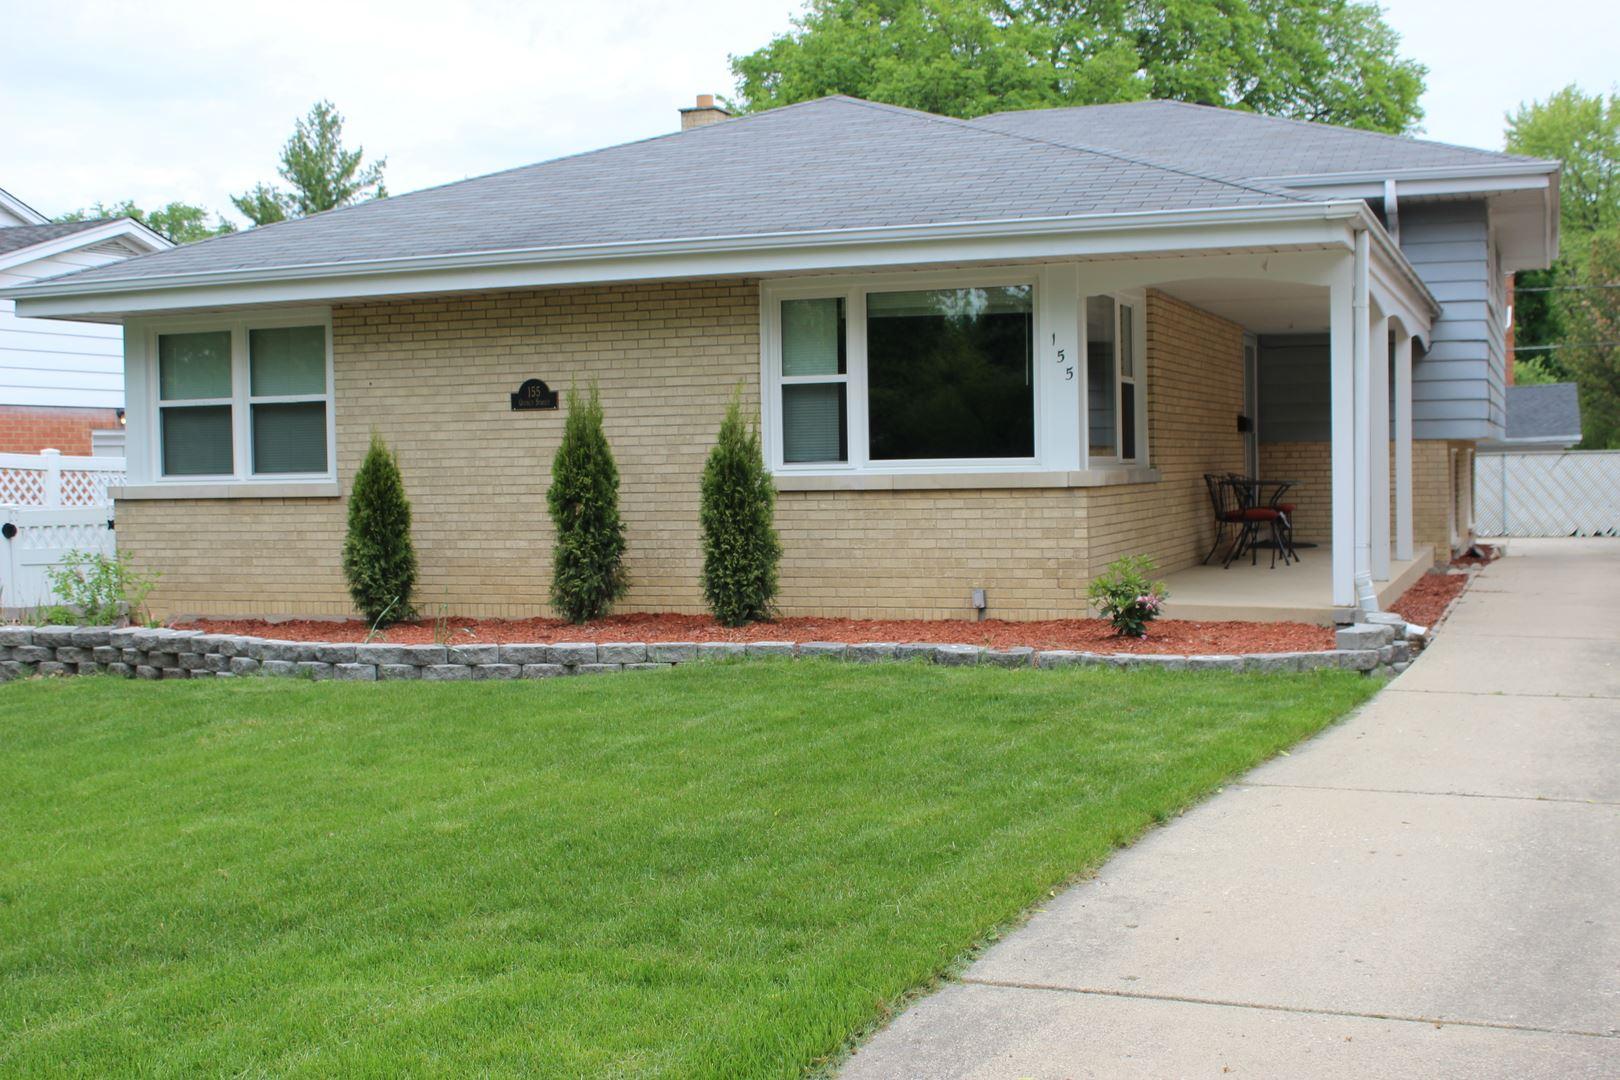 155 E Quincy Street, Elmhurst, IL 60126 - #: 10731162